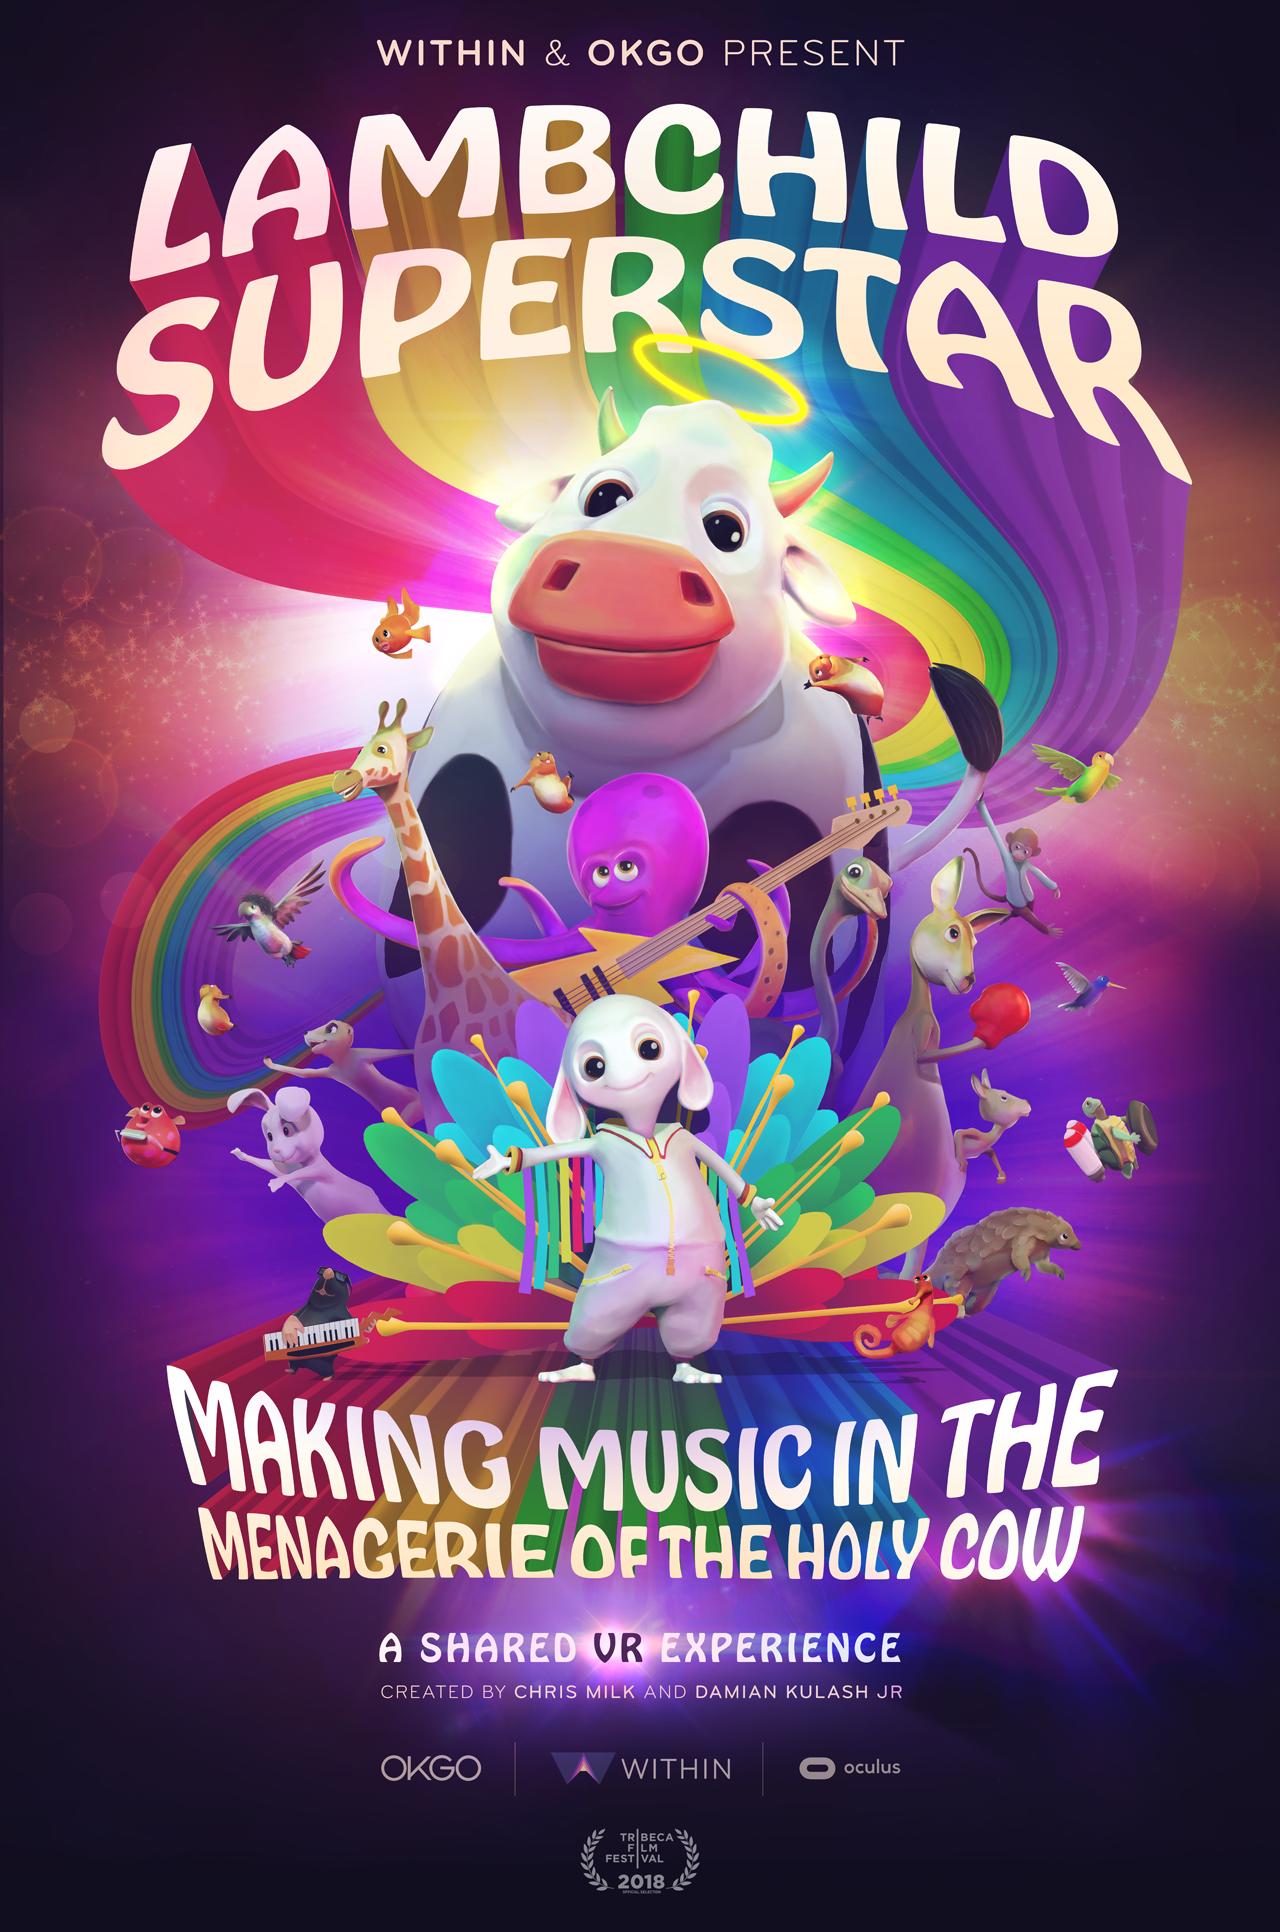 VR Experience: Lambchild Superstar